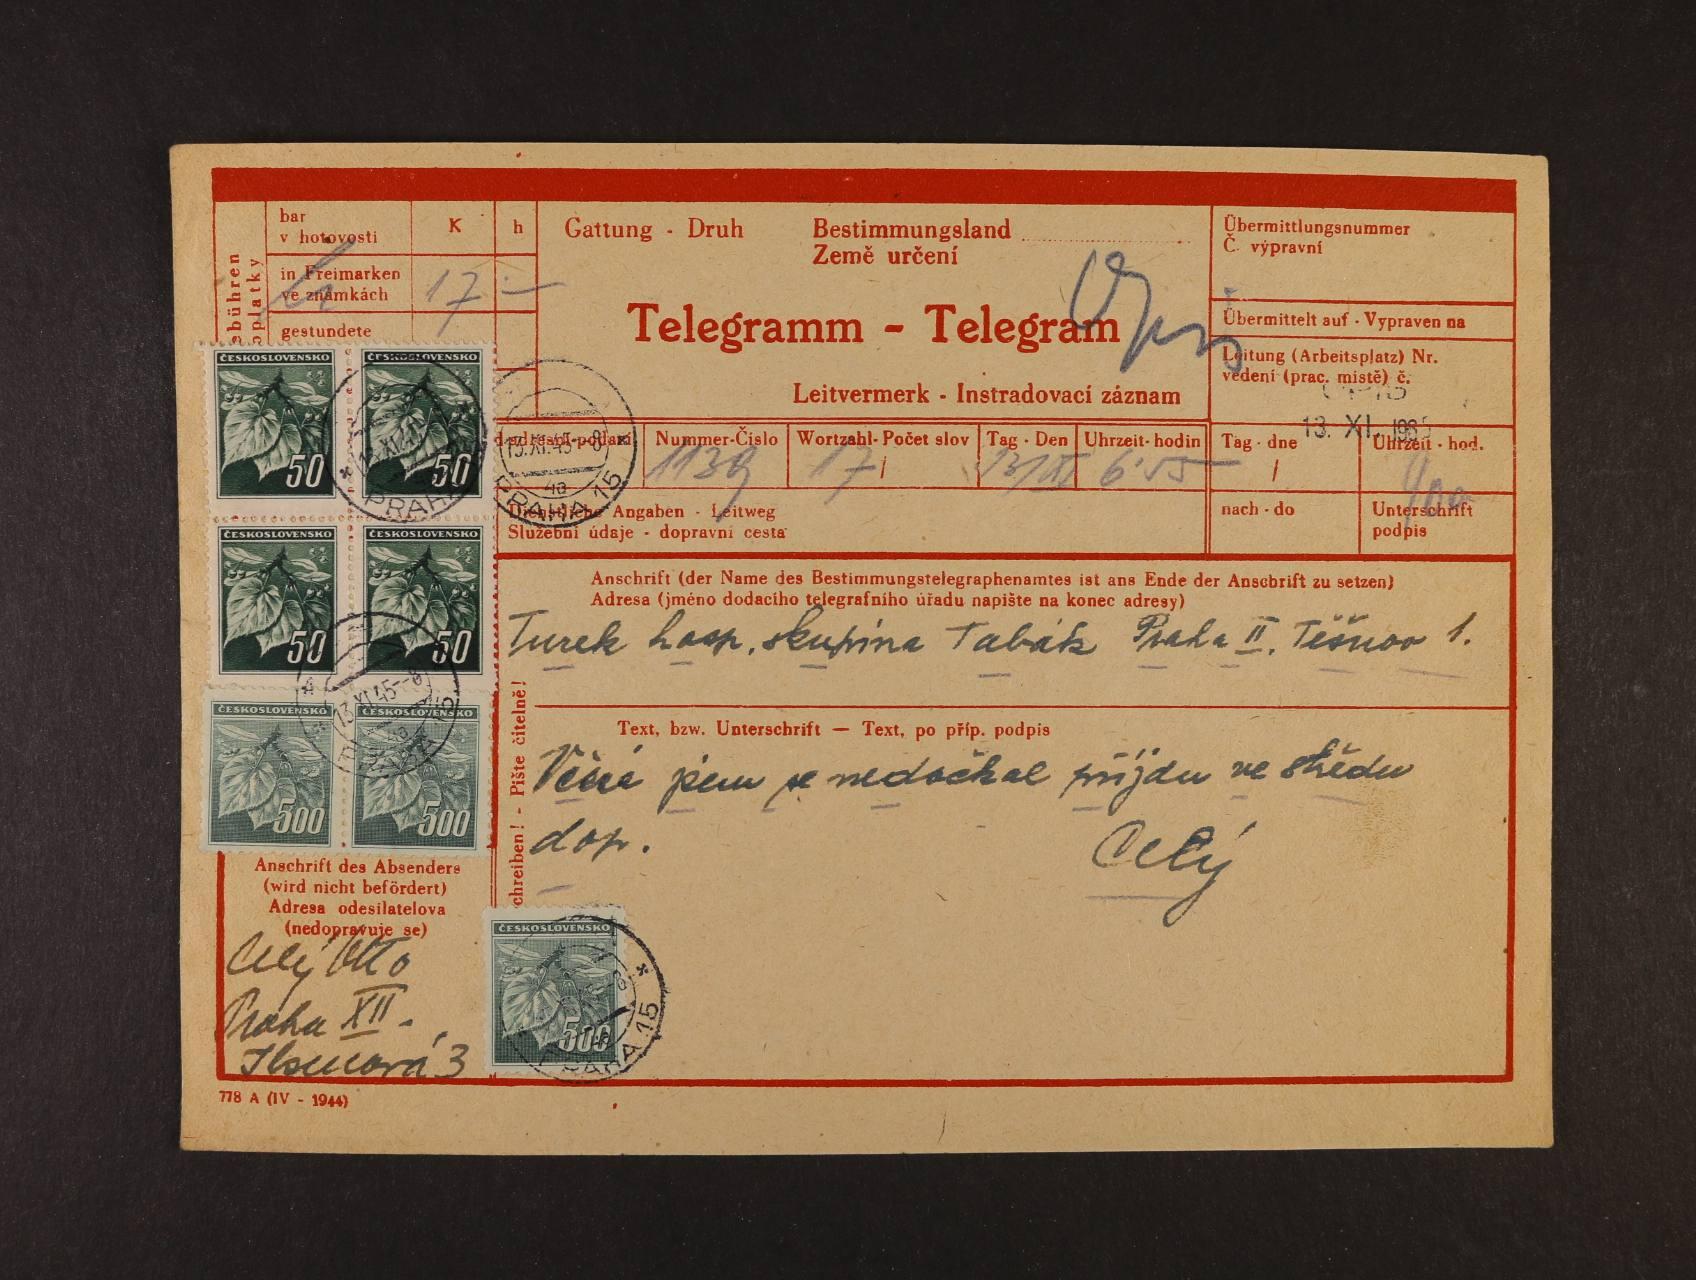 protektorátní dvojjazyčný formulář Telegramm - Telegram frank. čtyřblokem zn. č. 374 a 3x zn. č. 379, raz. PRAHA 15 13.11.1945, lux. kvalita, zajímavé